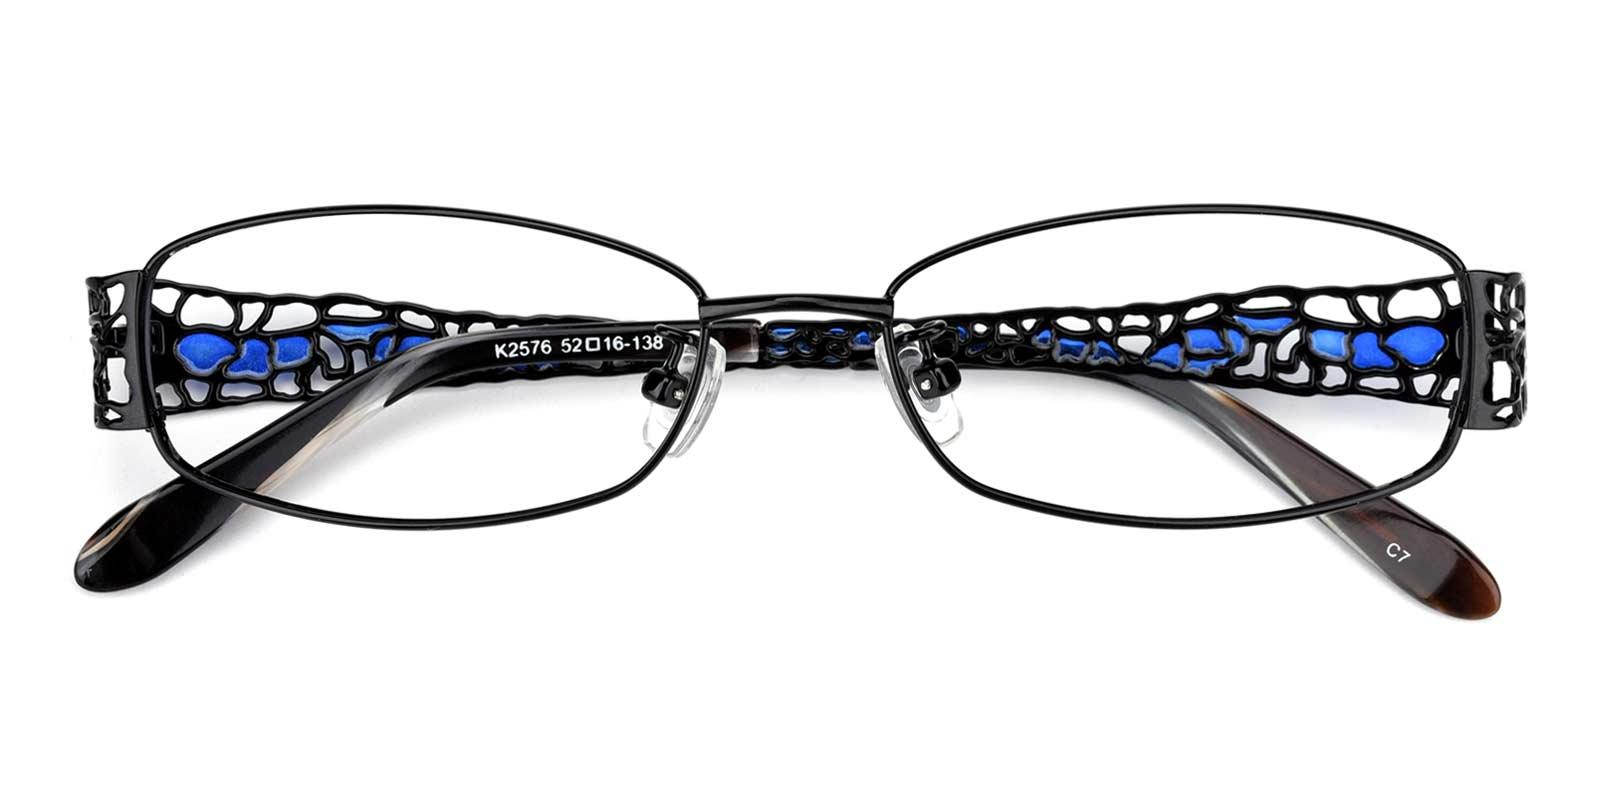 Spider-Black-Rectangle-Metal-Eyeglasses-detail